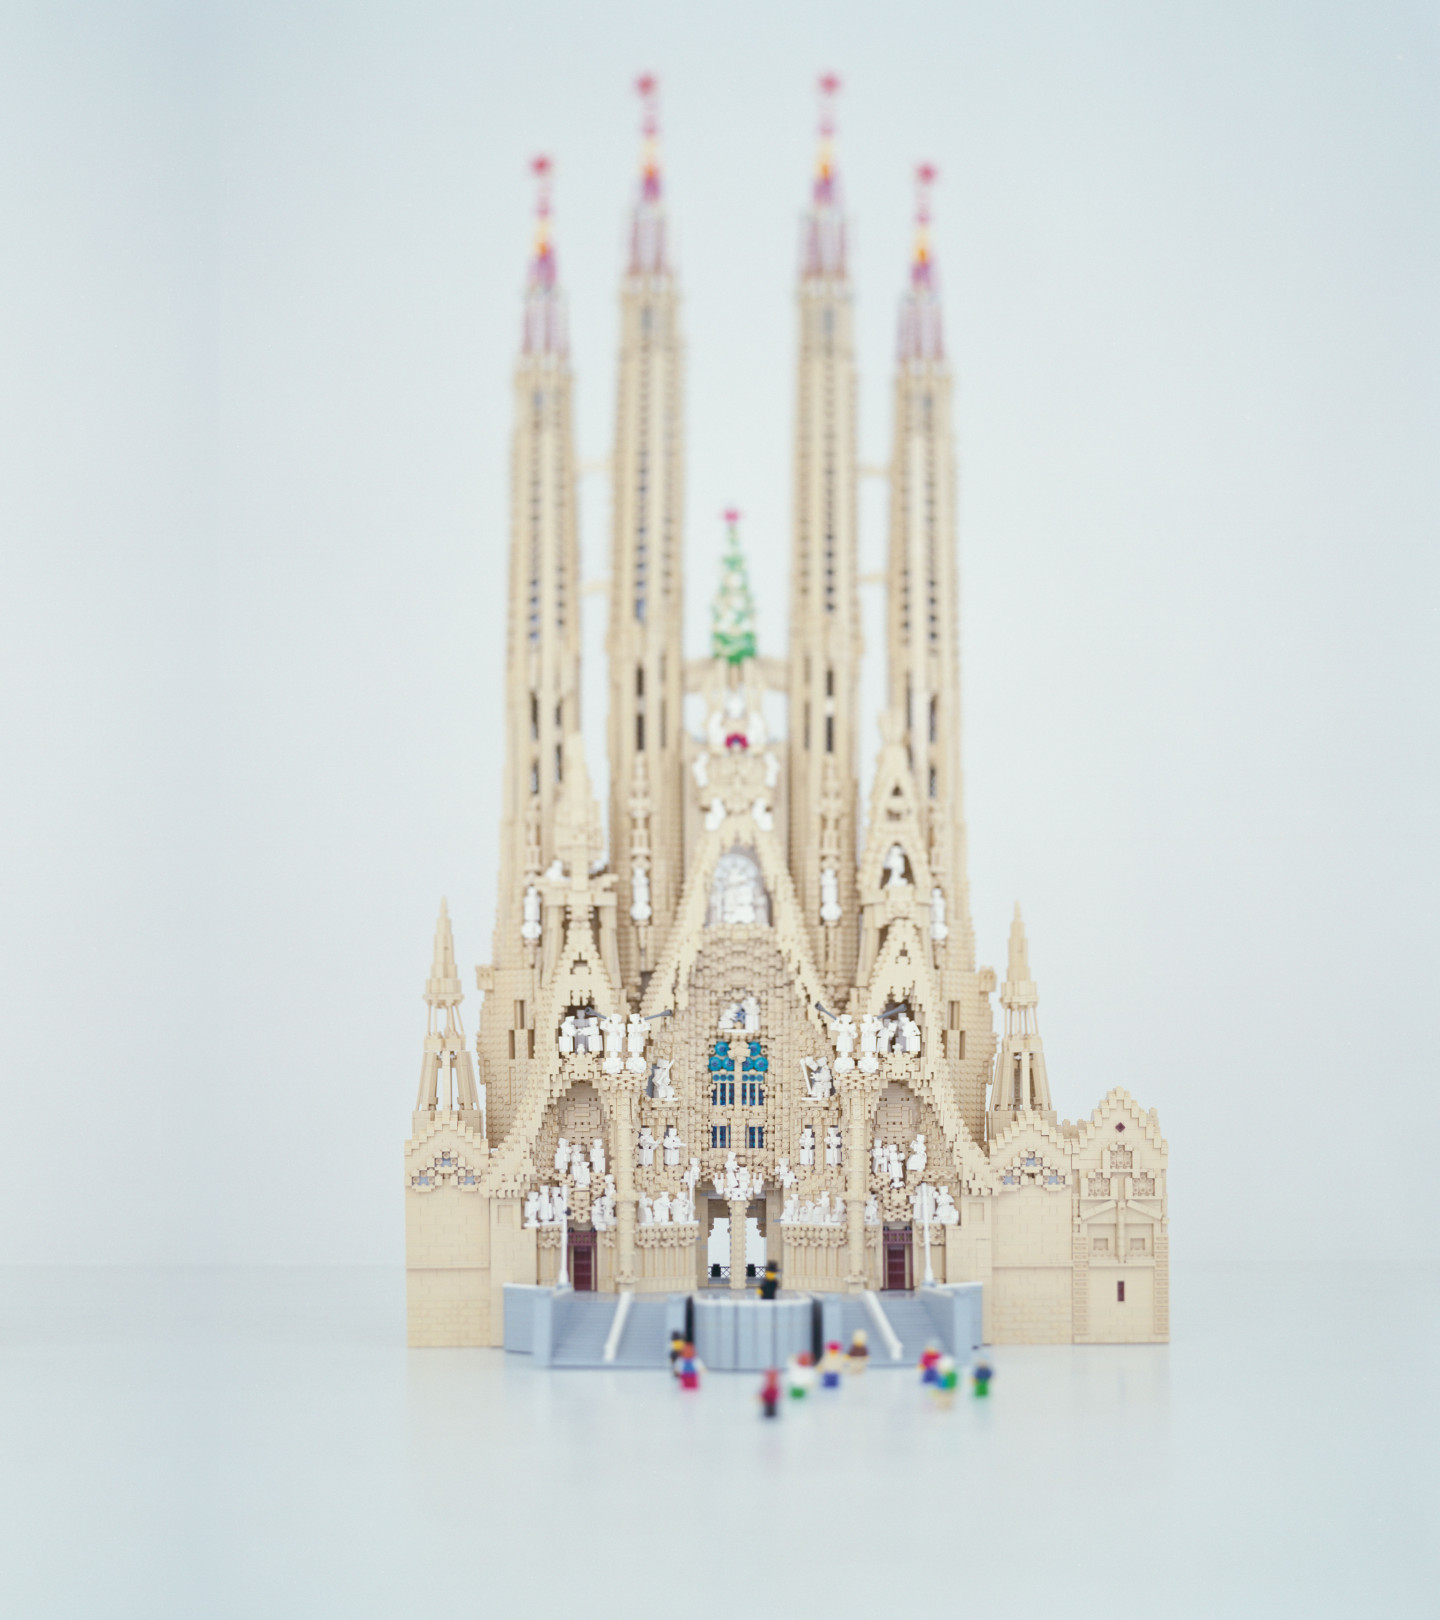 「PIECE OF PEACE-『レゴ®ブロック』で作った世界遺産展 PART-3」